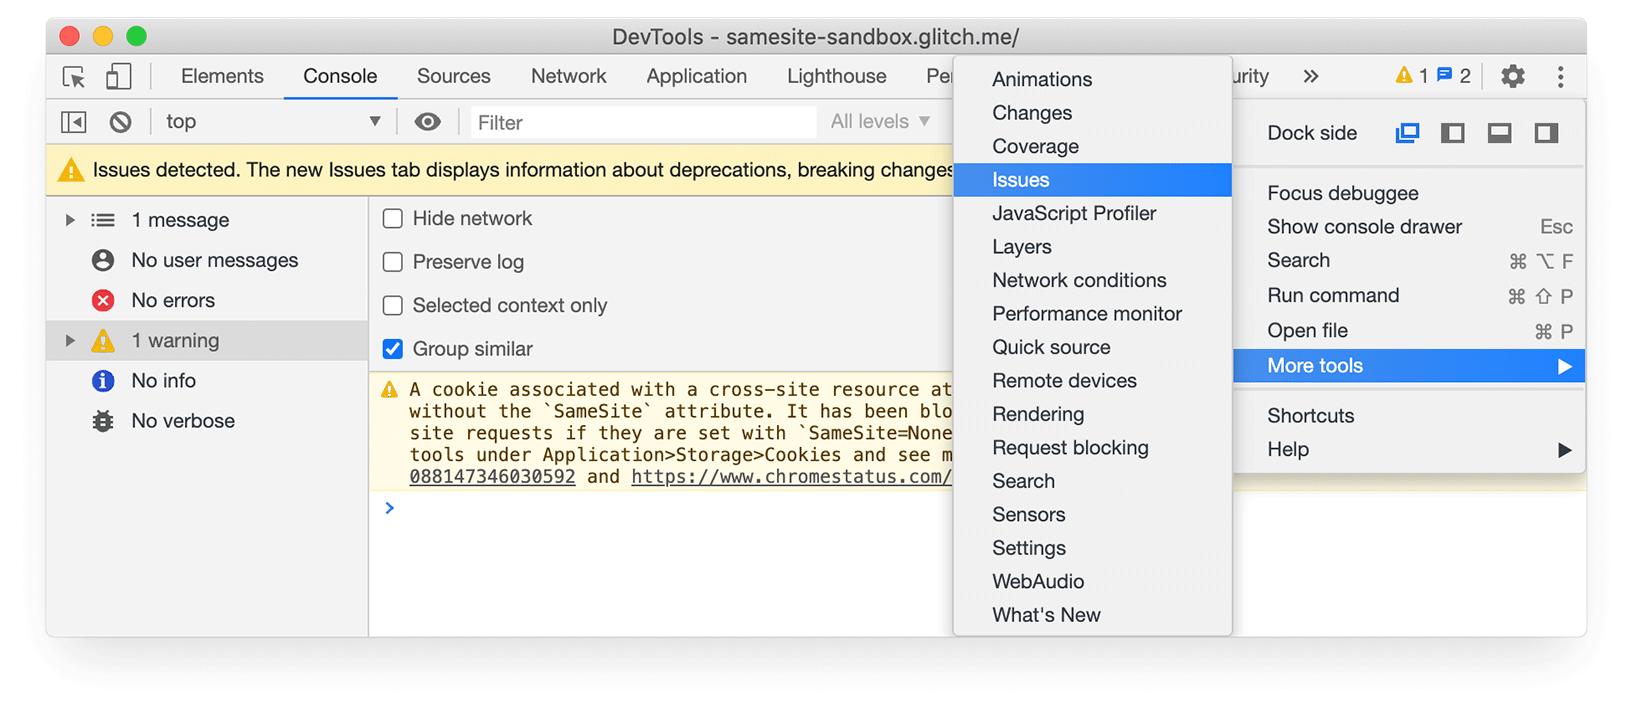 Chrome DevTools screenshot showing Issues tab in More tools menu.